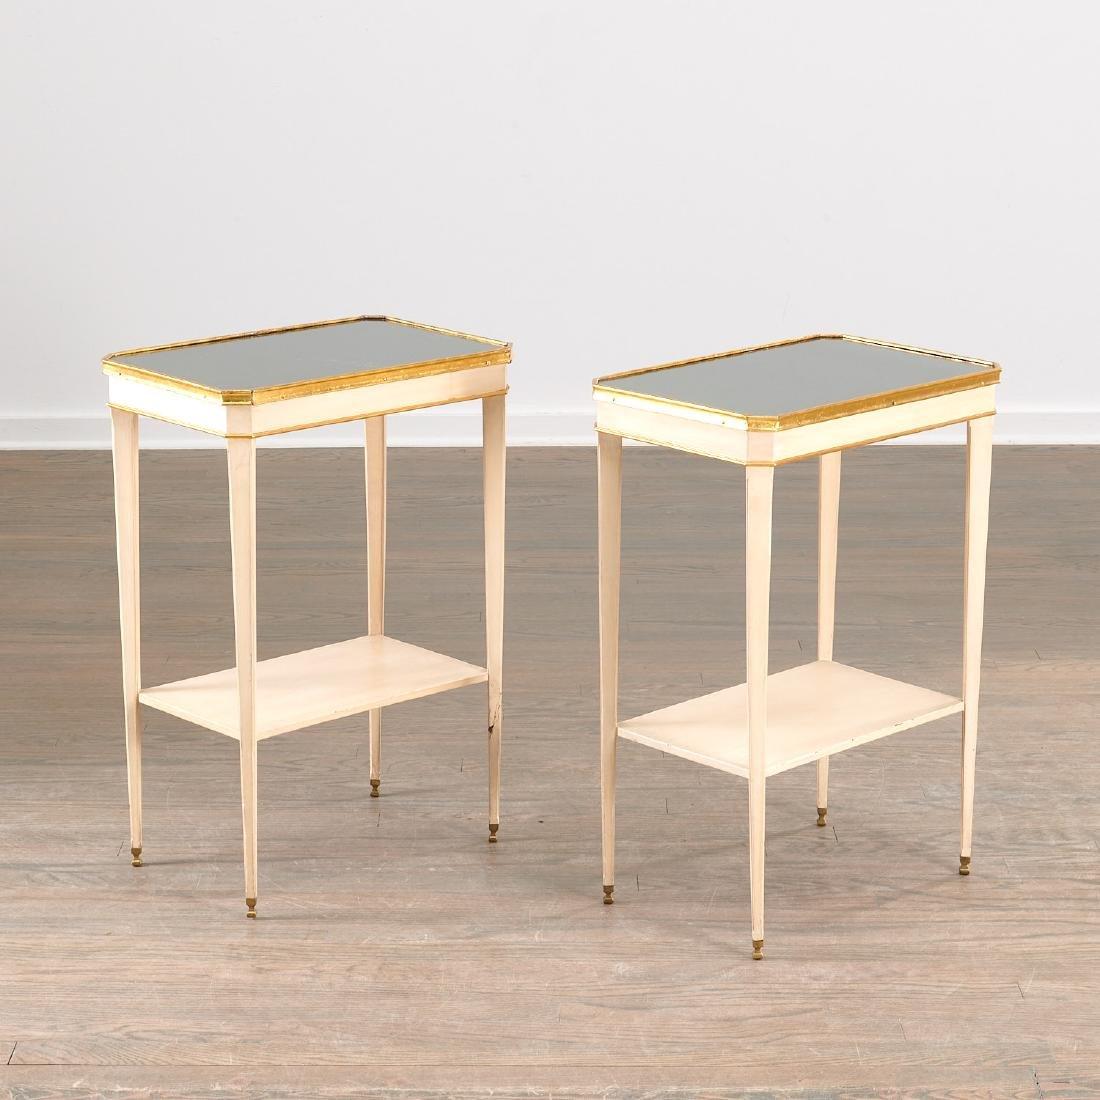 Fine Maison Jansen tiered side tables